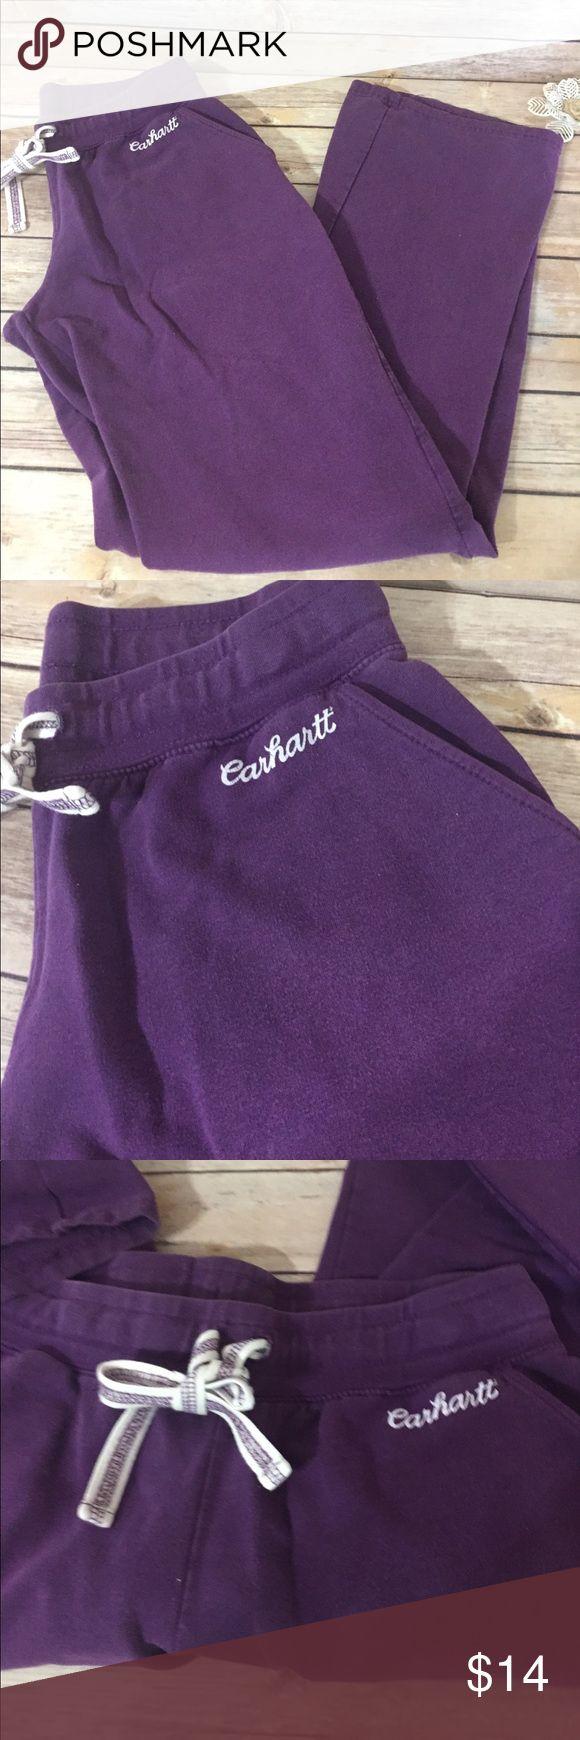 "Carhartt Purple Casual Pants Sz Small Cute comfy purple cotton/spandex pull on pants. Sz small, great condition. Waist 28"" inseam 29"". B61 Carhartt Pants Track Pants & Joggers"